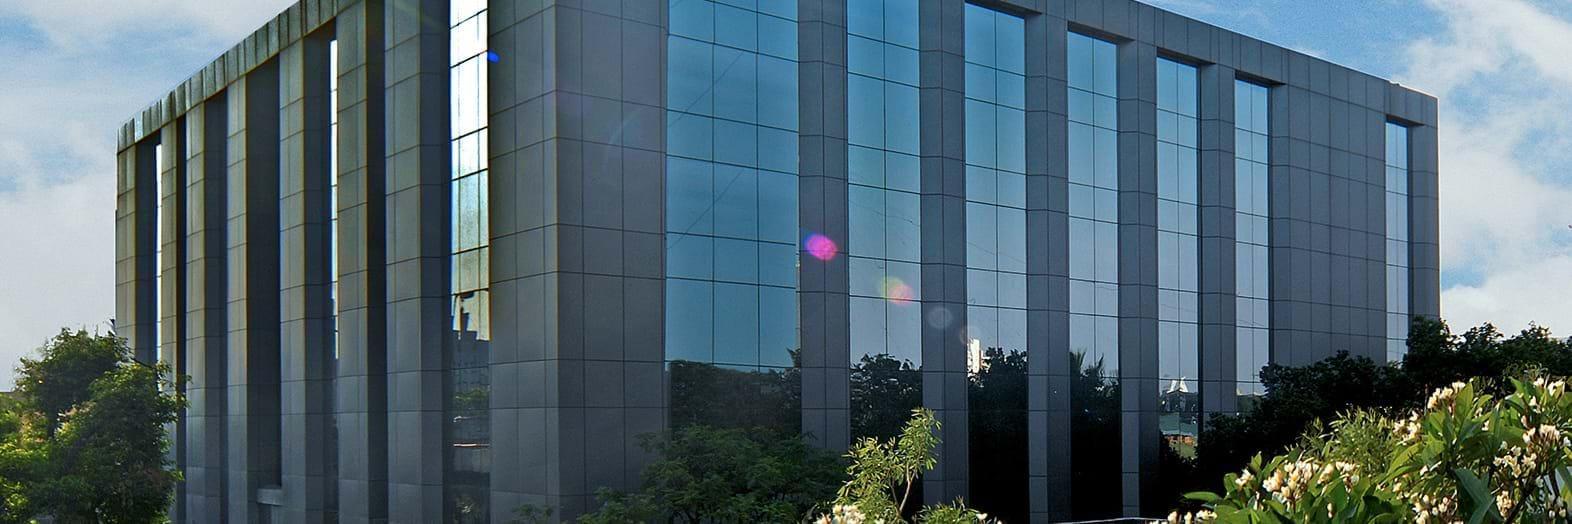 Hotels in Bengaluru - Fortune Park JP Celestial